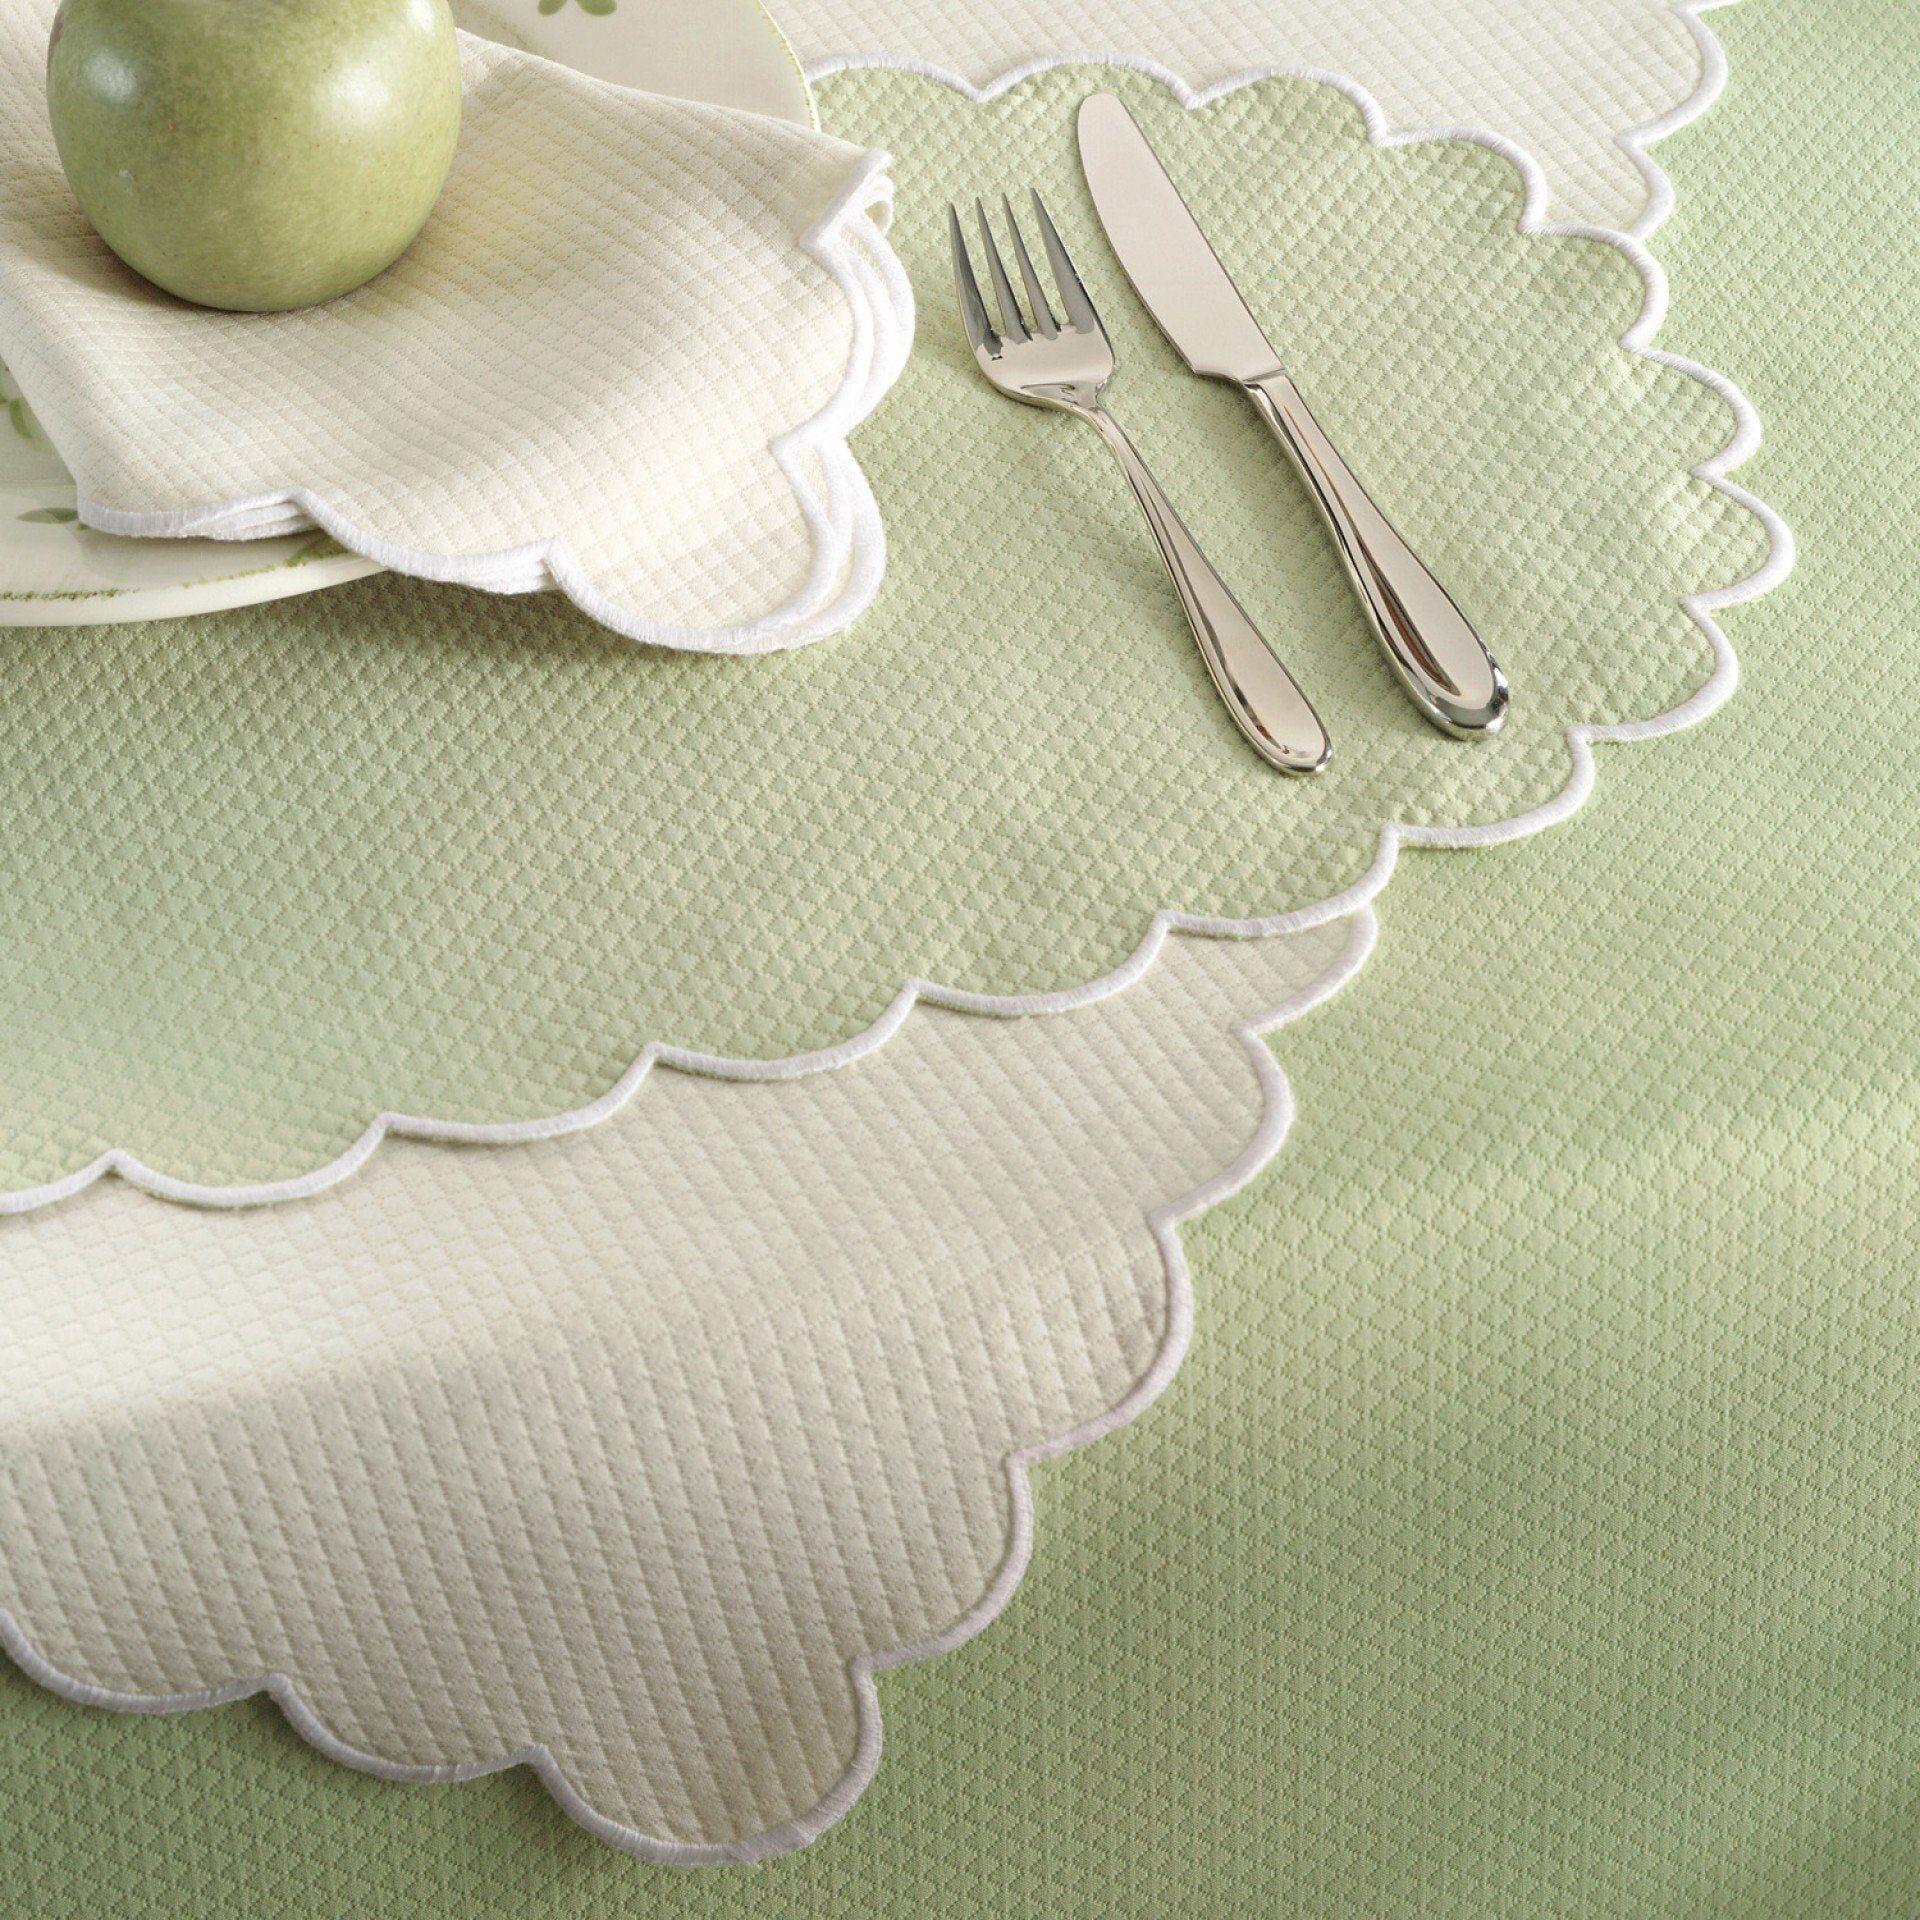 Matouk Savannah Gardens Oblong Tablecloths by Matouk